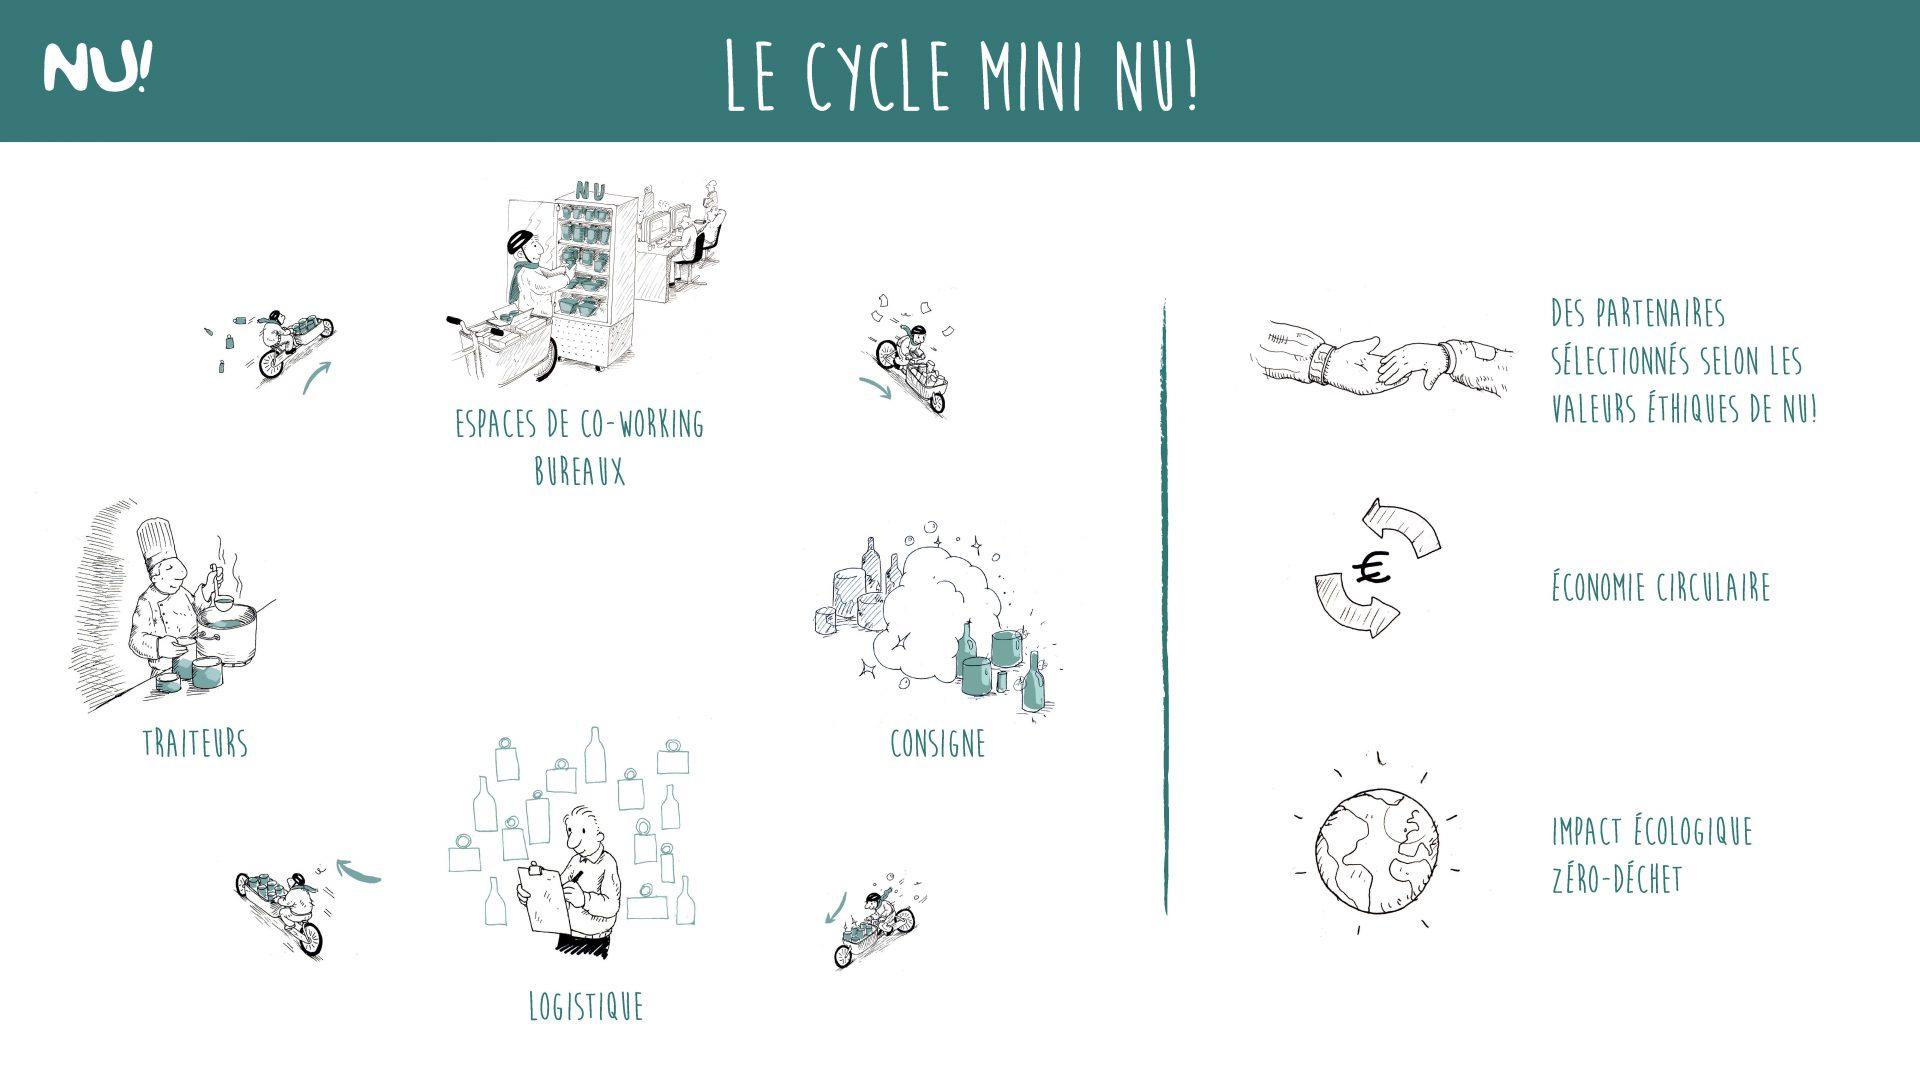 8-halle-nu-et-mini-nu_rf-studio_02-05-2016_page_19